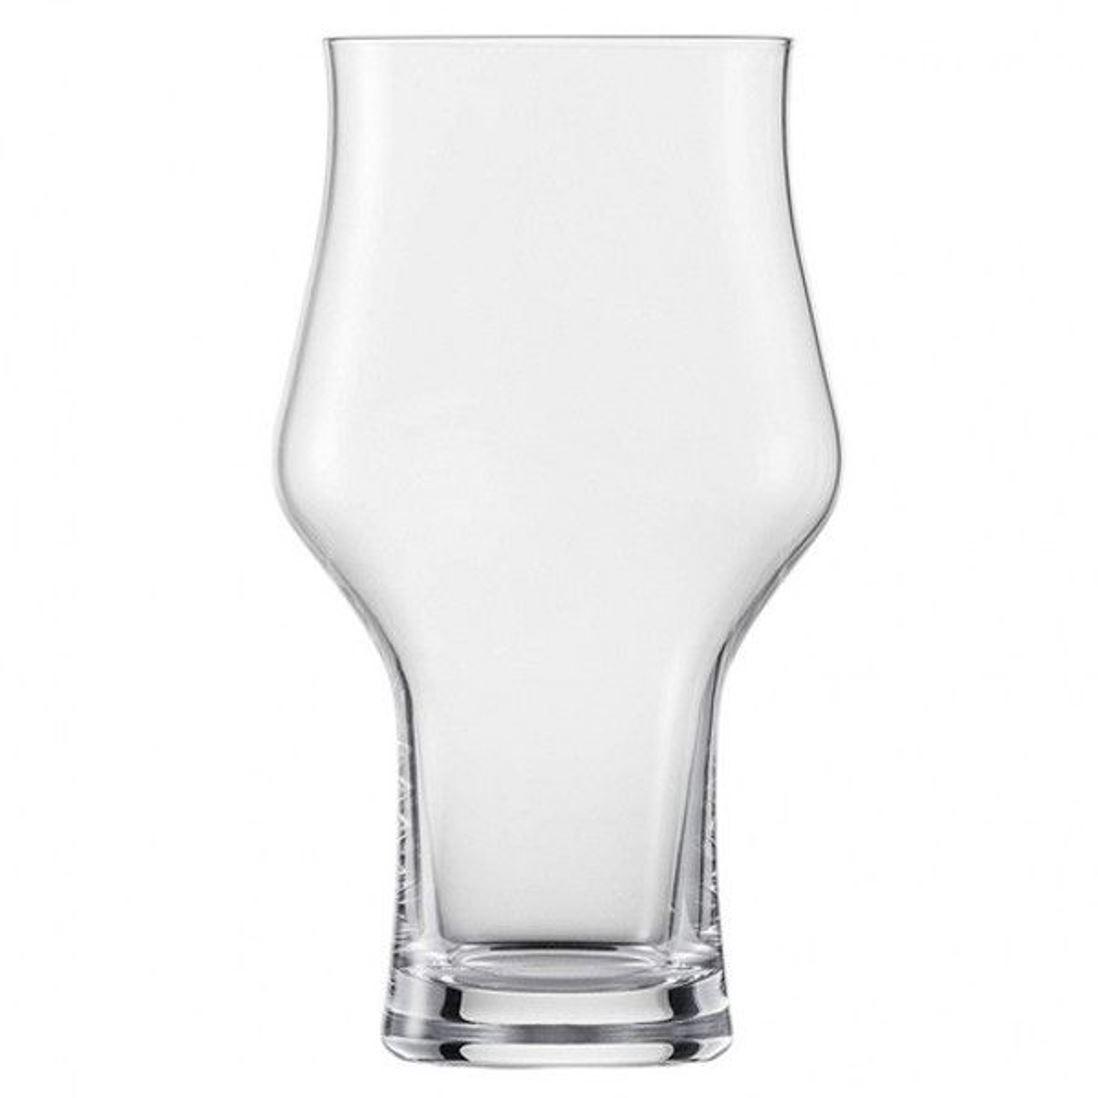 Онлайн каталог PROMENU: Бокал для пива Stout Schott Zwiesel BEER BASIC CRAFT, объем 0,48 л, прозрачный                               120713